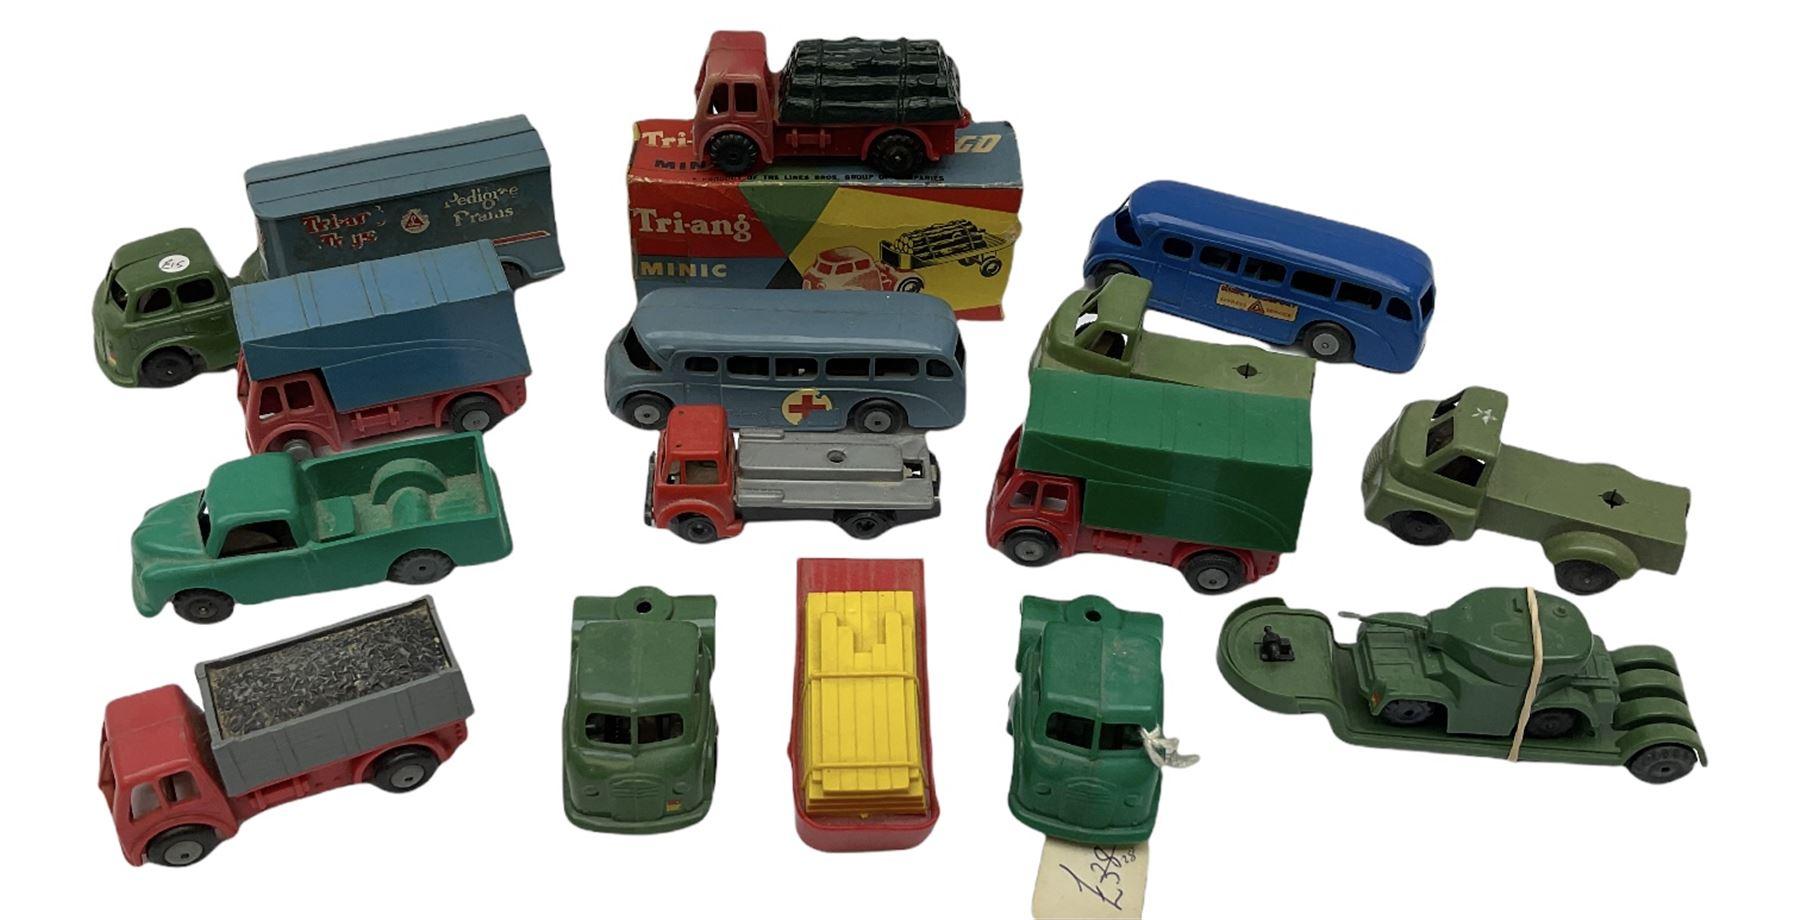 Tri-ang/Tri-ang Minic - twelve plastic friction-drive vehicles comprising Tri-ang Toys/Pedigree Pram - Image 2 of 7